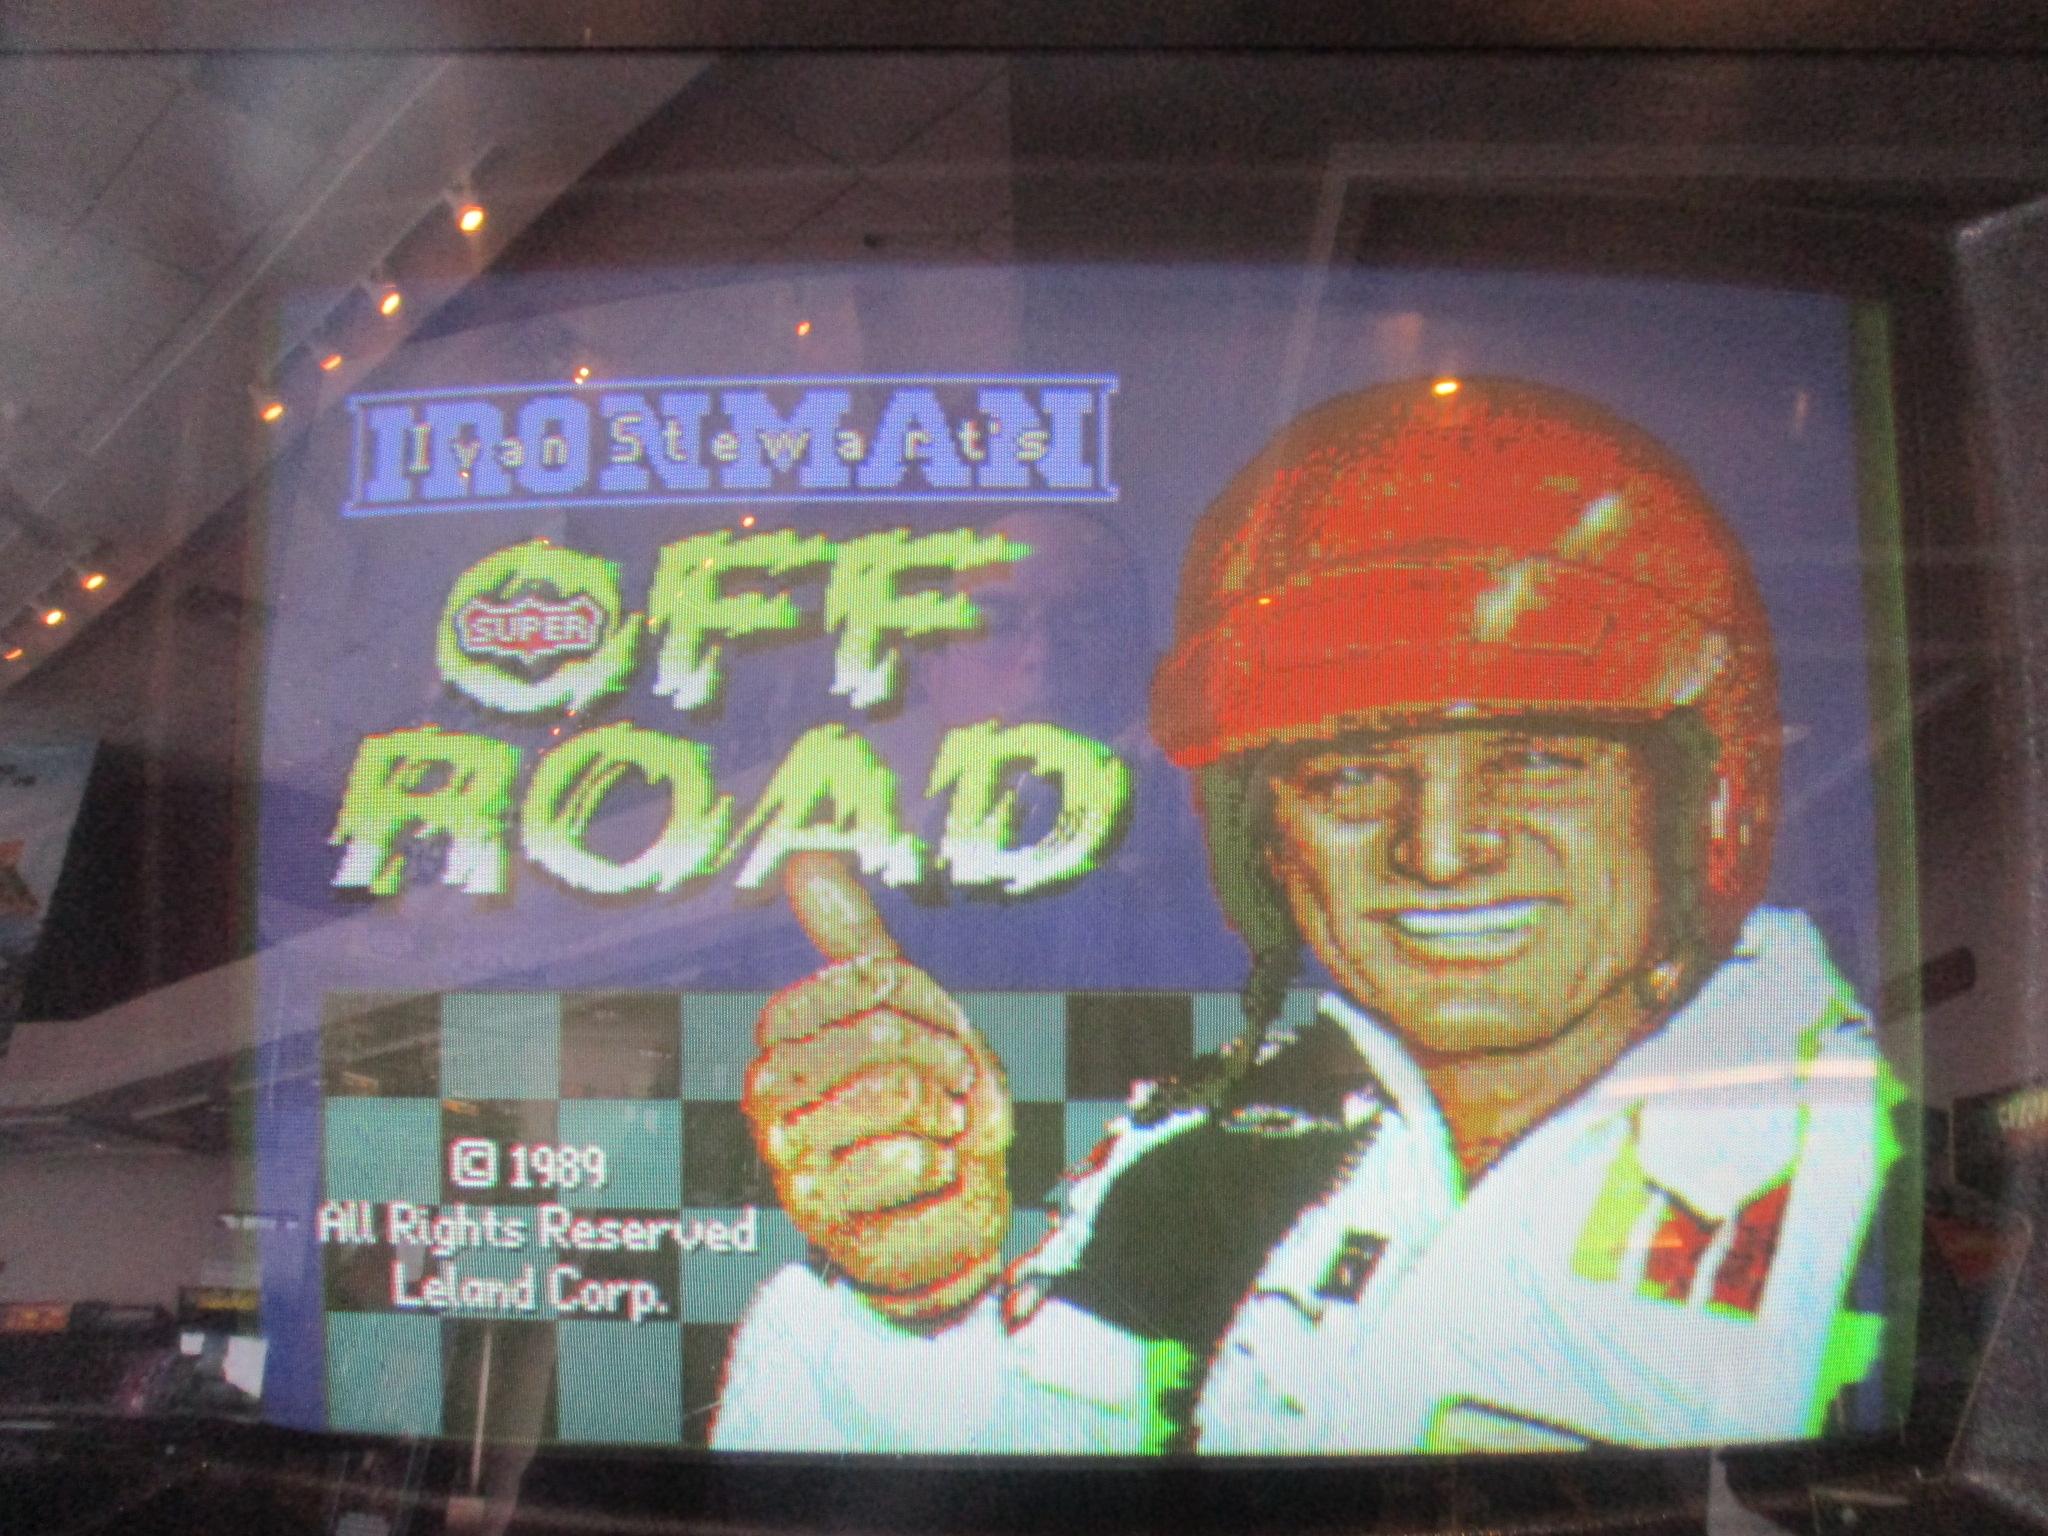 ed1475: Ivan Ironman Stewart